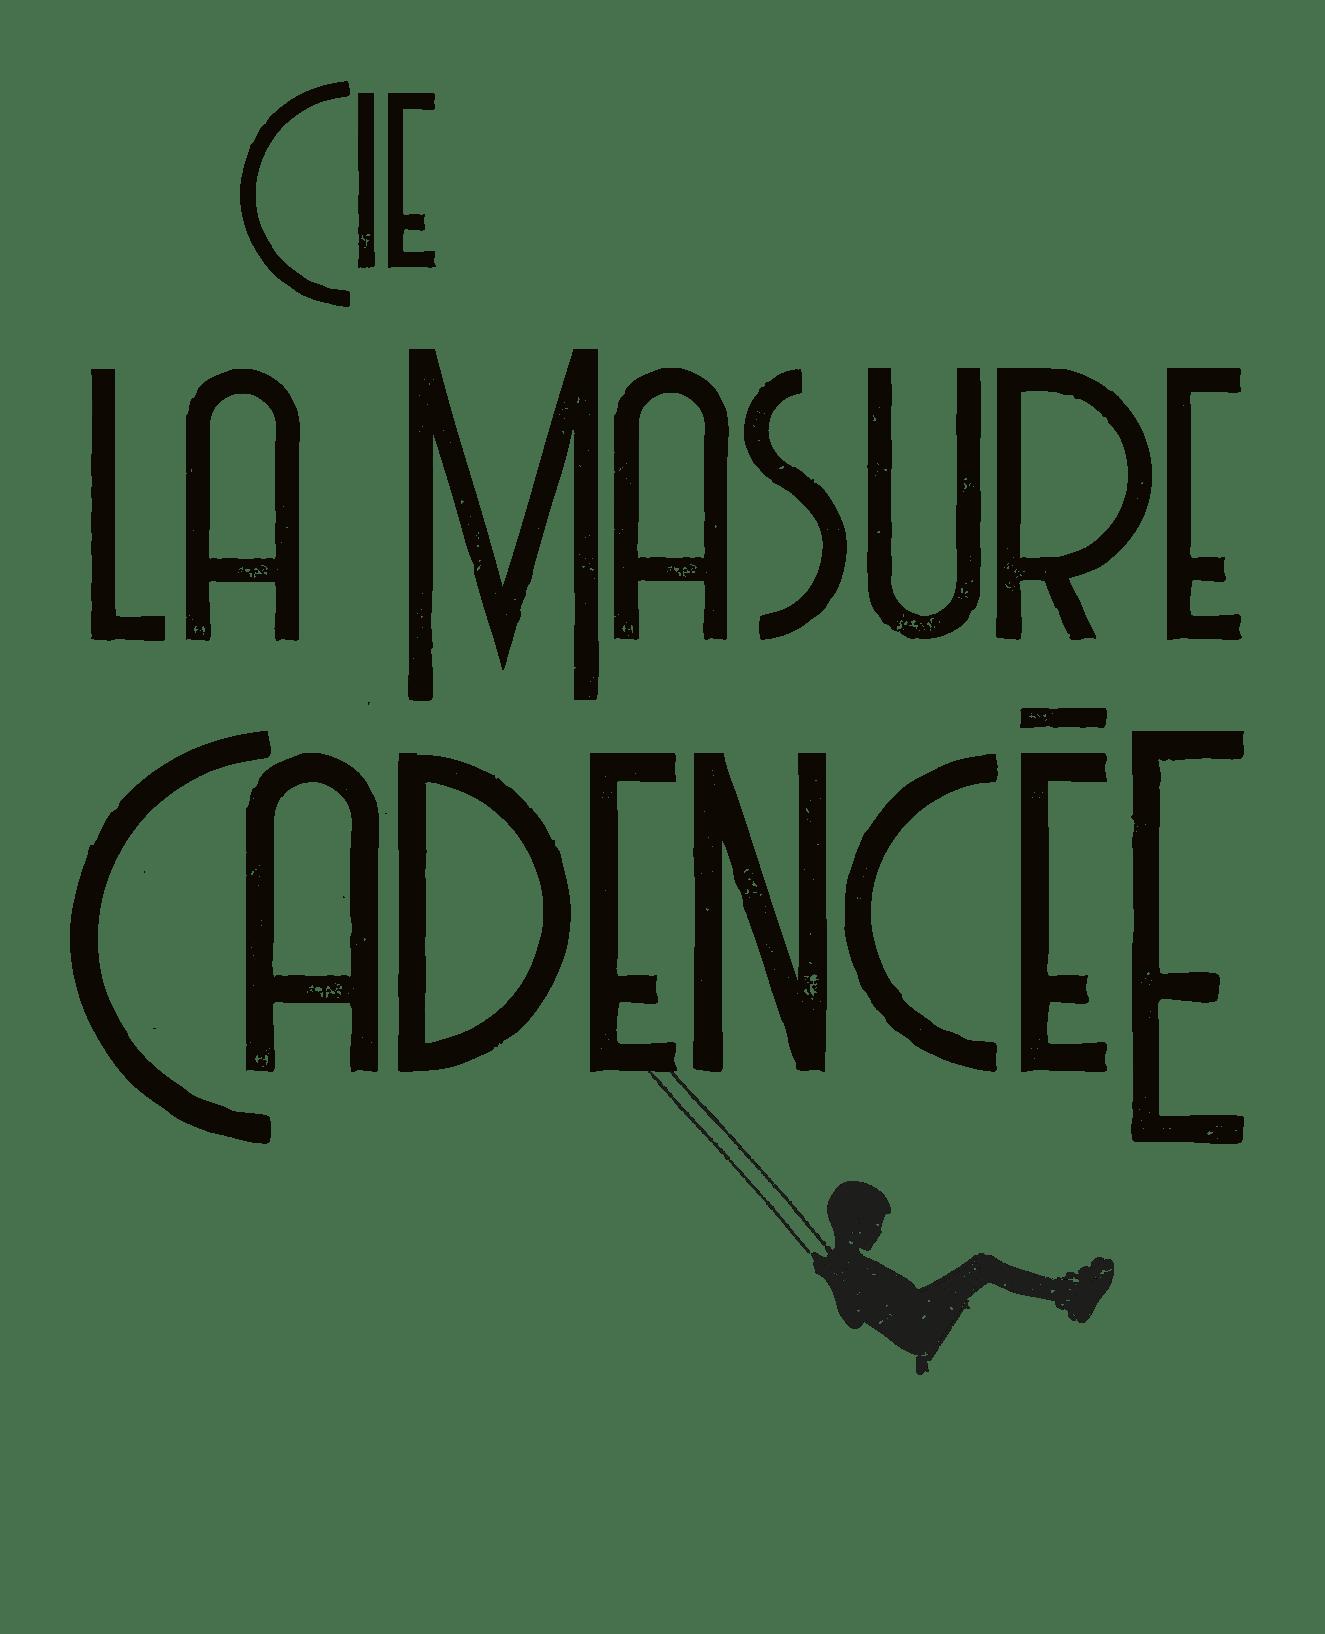 logo-masure-cadencee